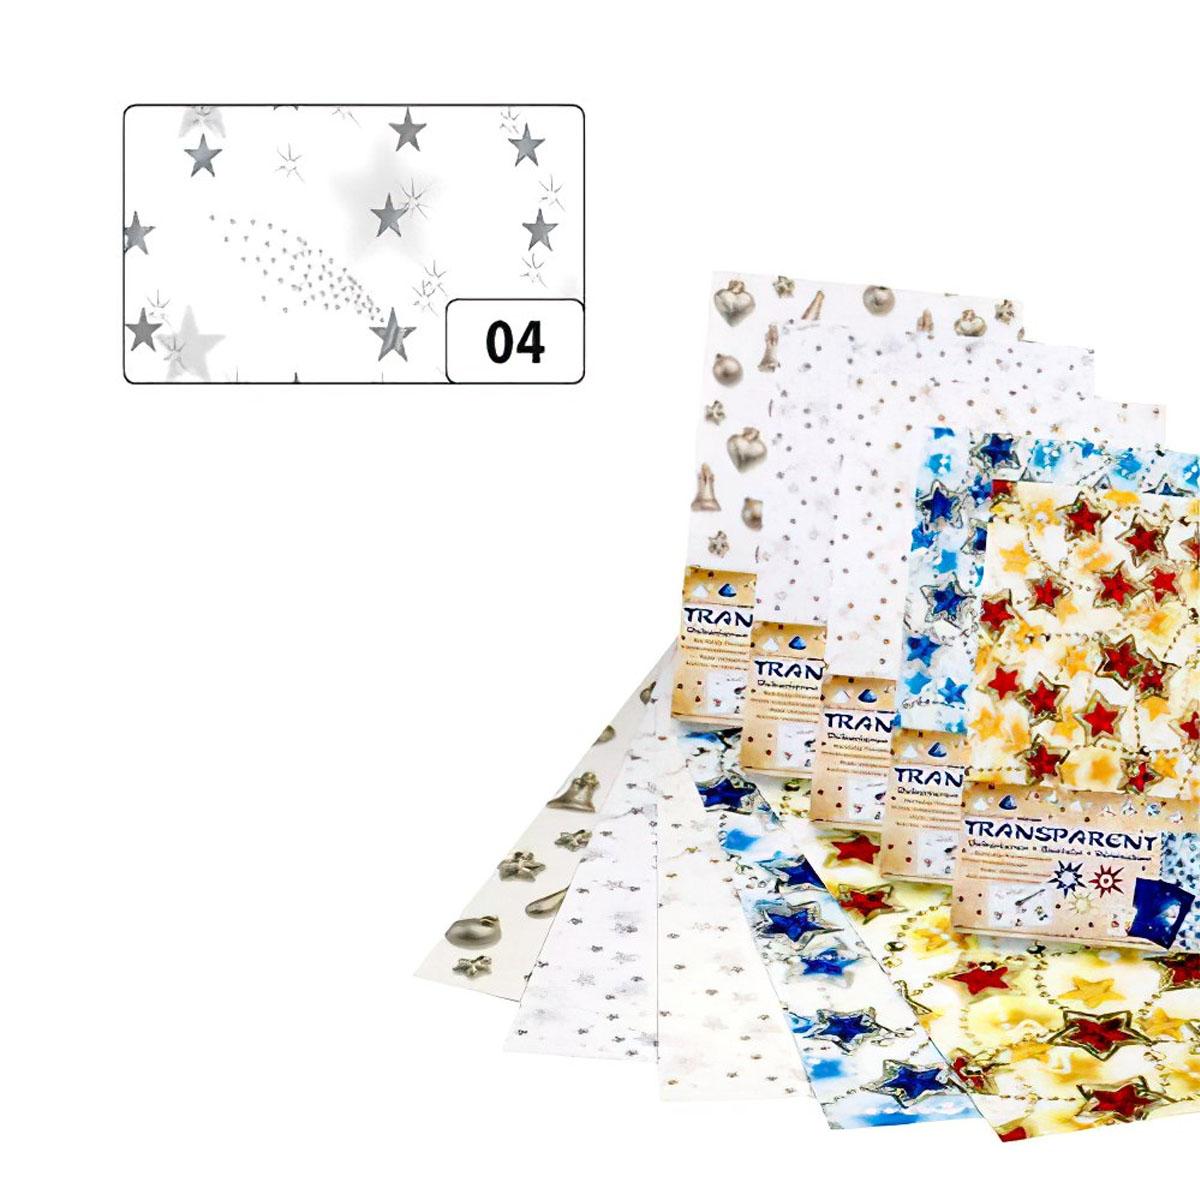 88104 Транспарентная бумага 'Звезды', серебро, 115 г/м², 50,5*70 см, Folia